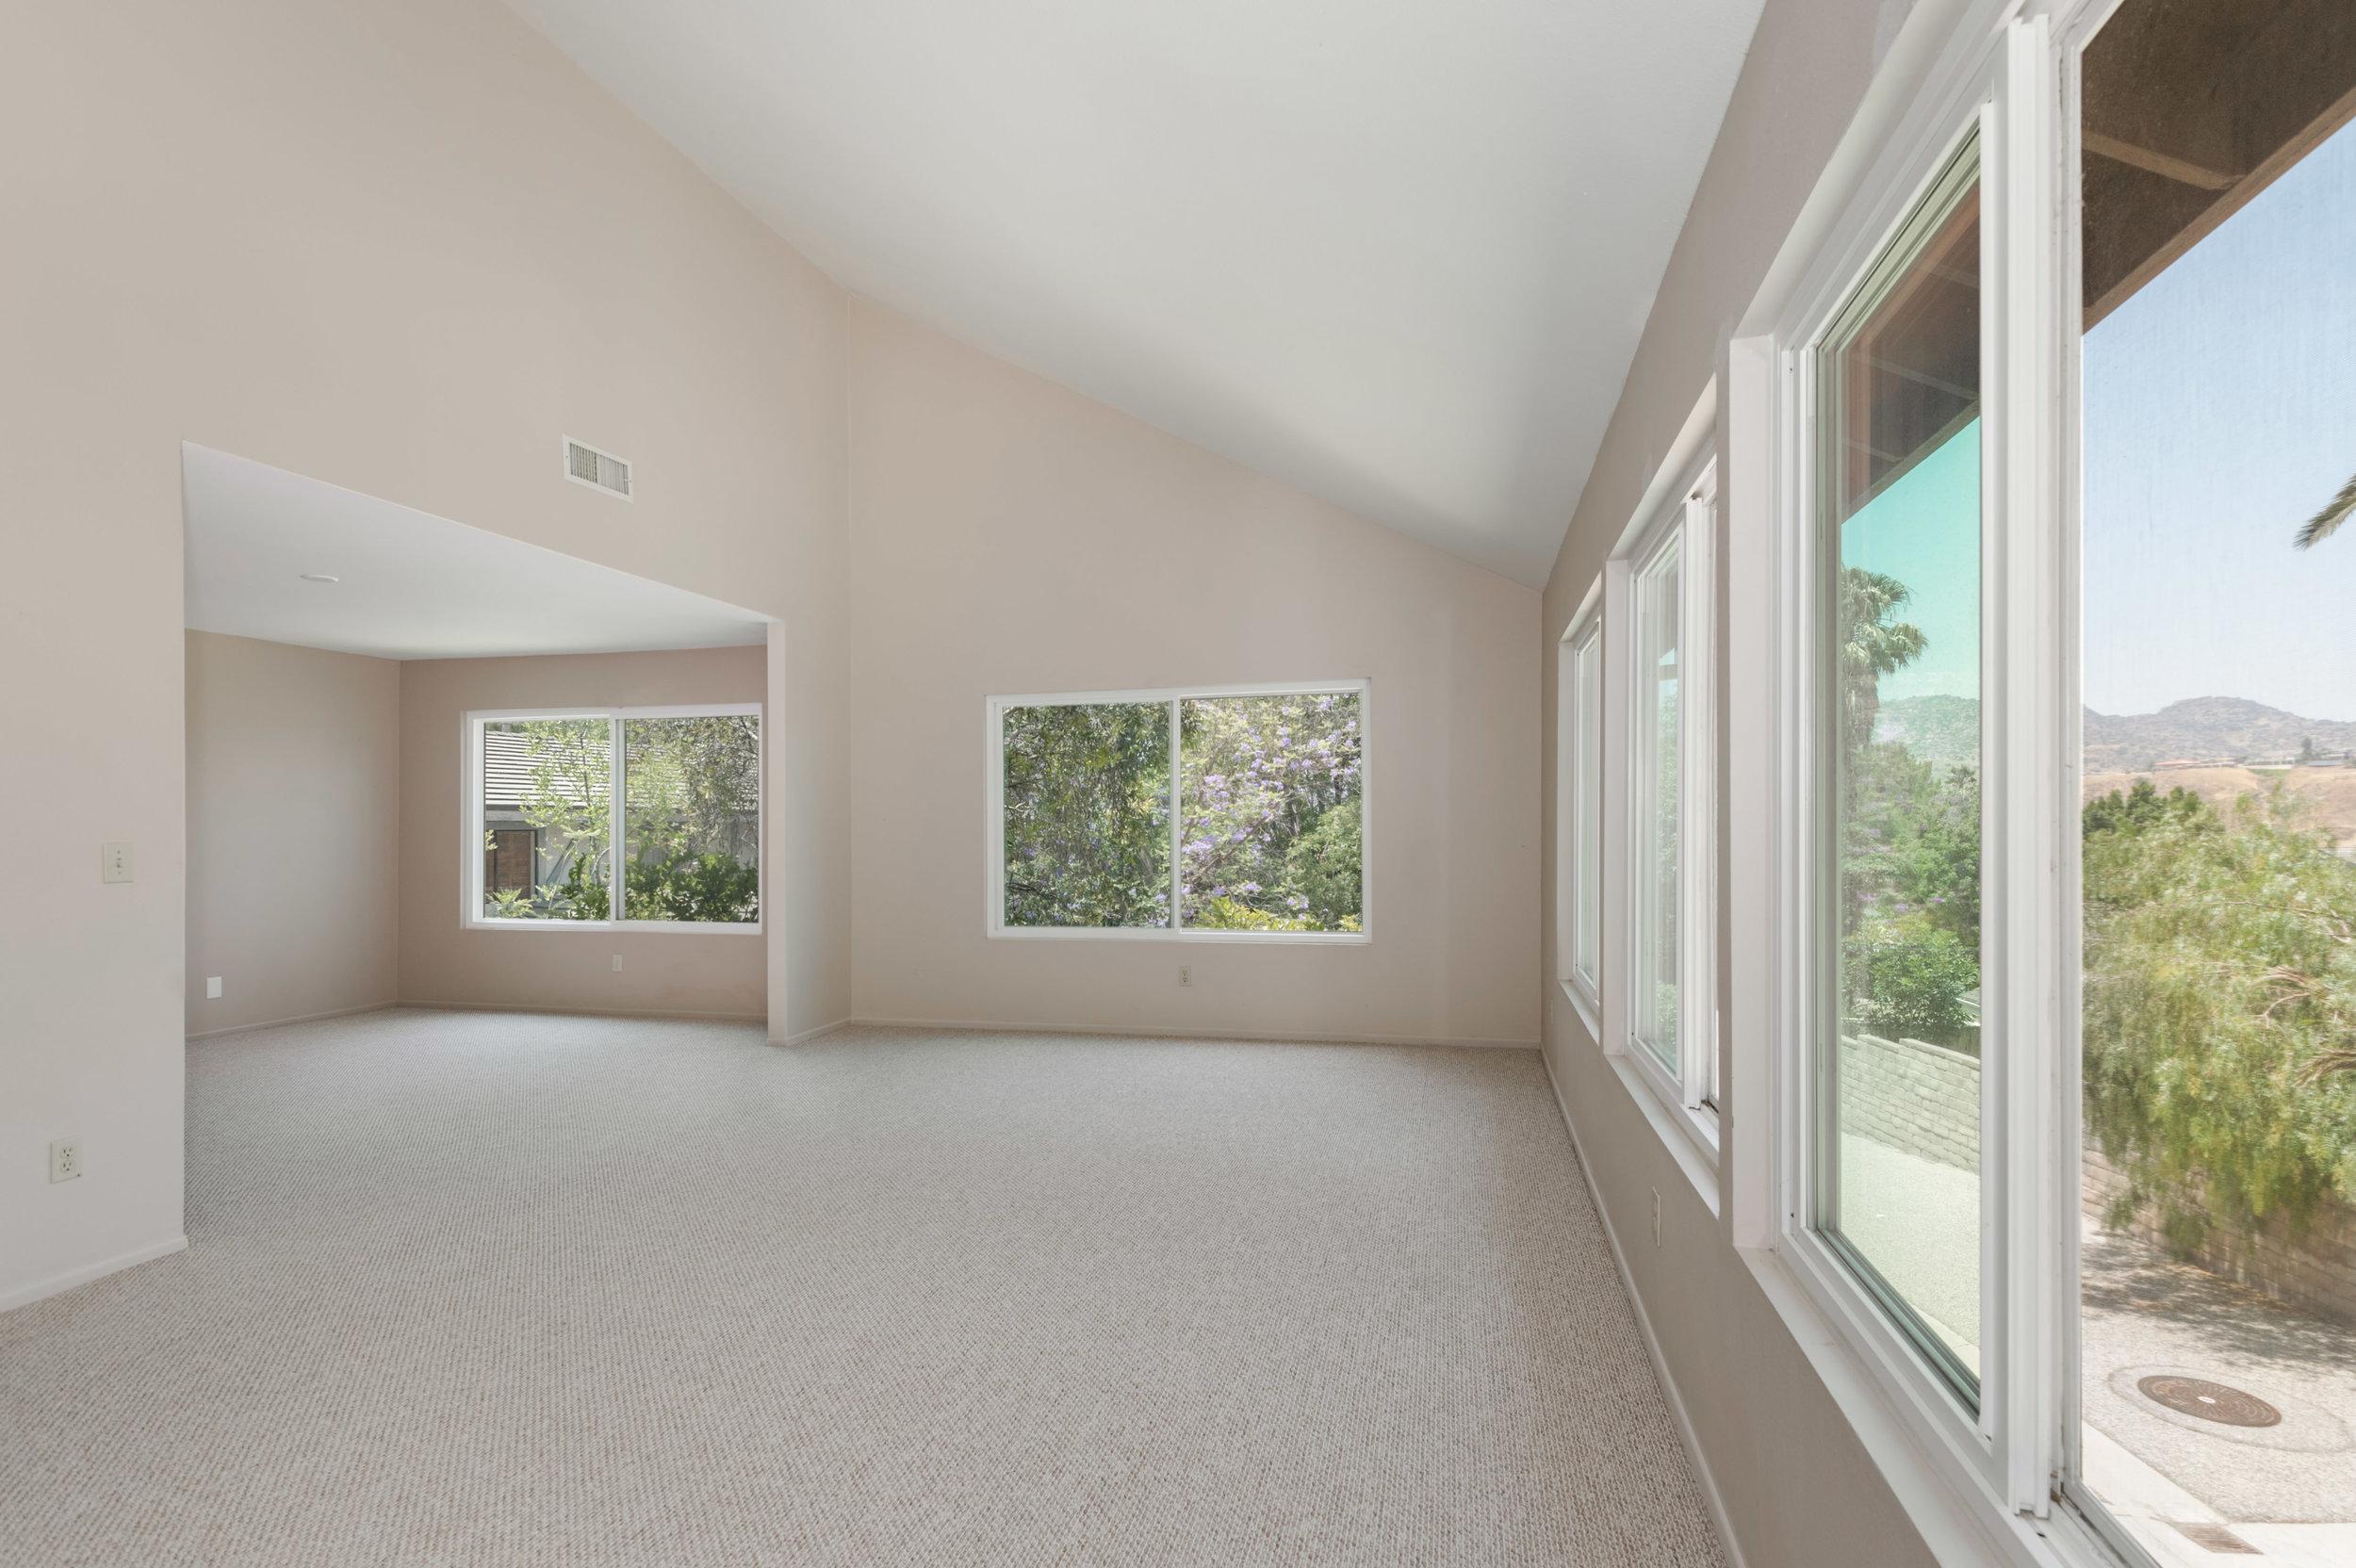 004 living room 8832 Moorcroft Avenue West Hills For Sale Lease The Malibu Life Team Luxury Real Estate.jpg